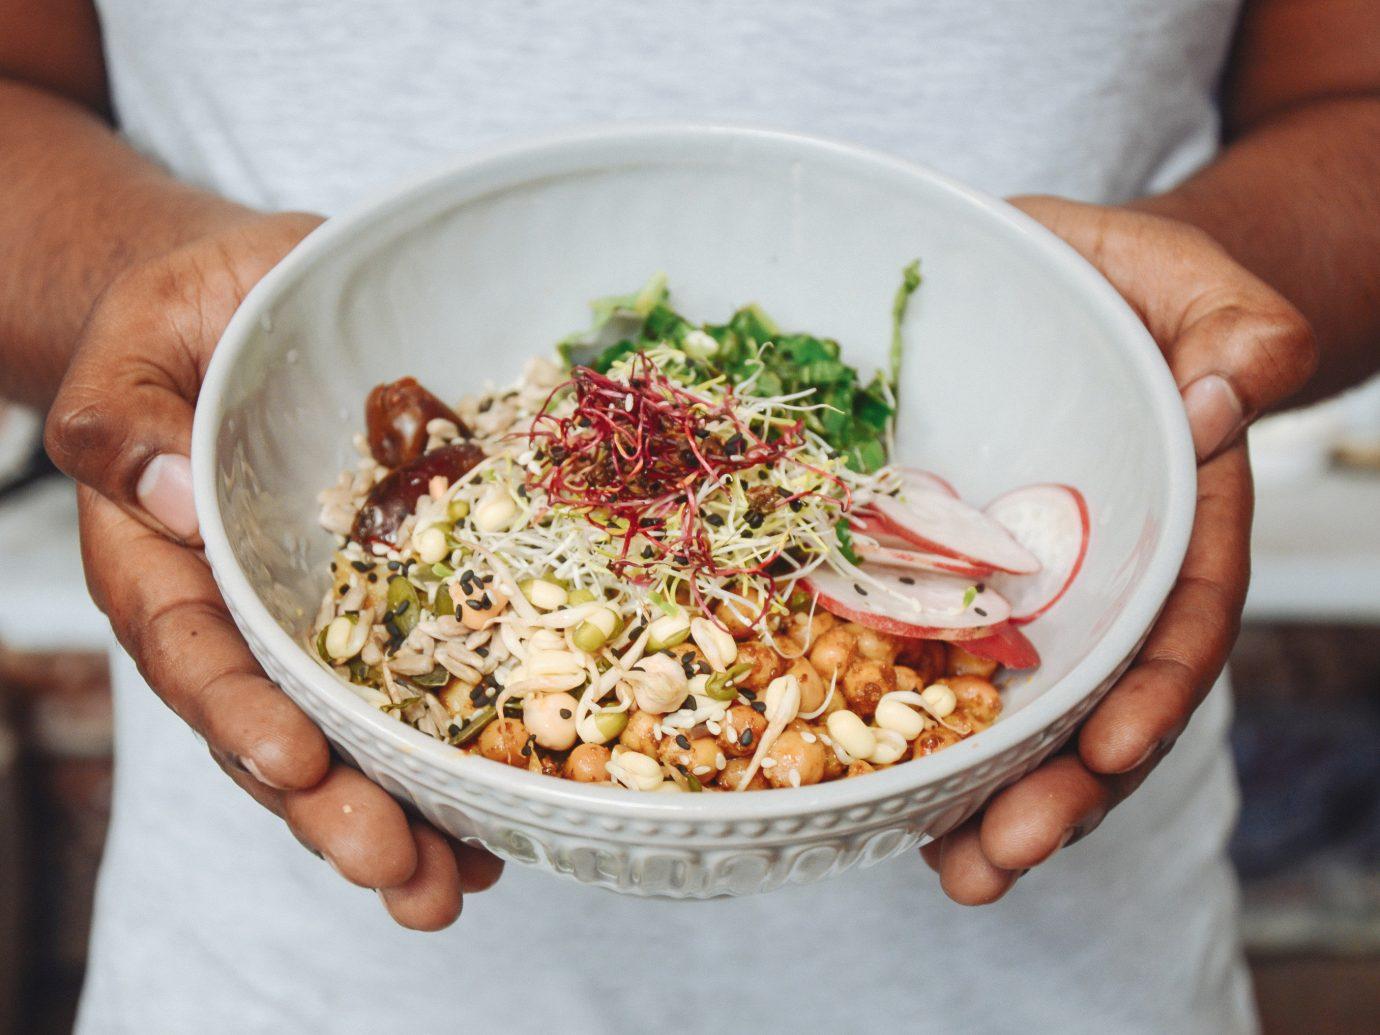 Food + Drink person food dish indoor plate holding meal cuisine hand breakfast produce sense vegetarian food snack food vegetable meat